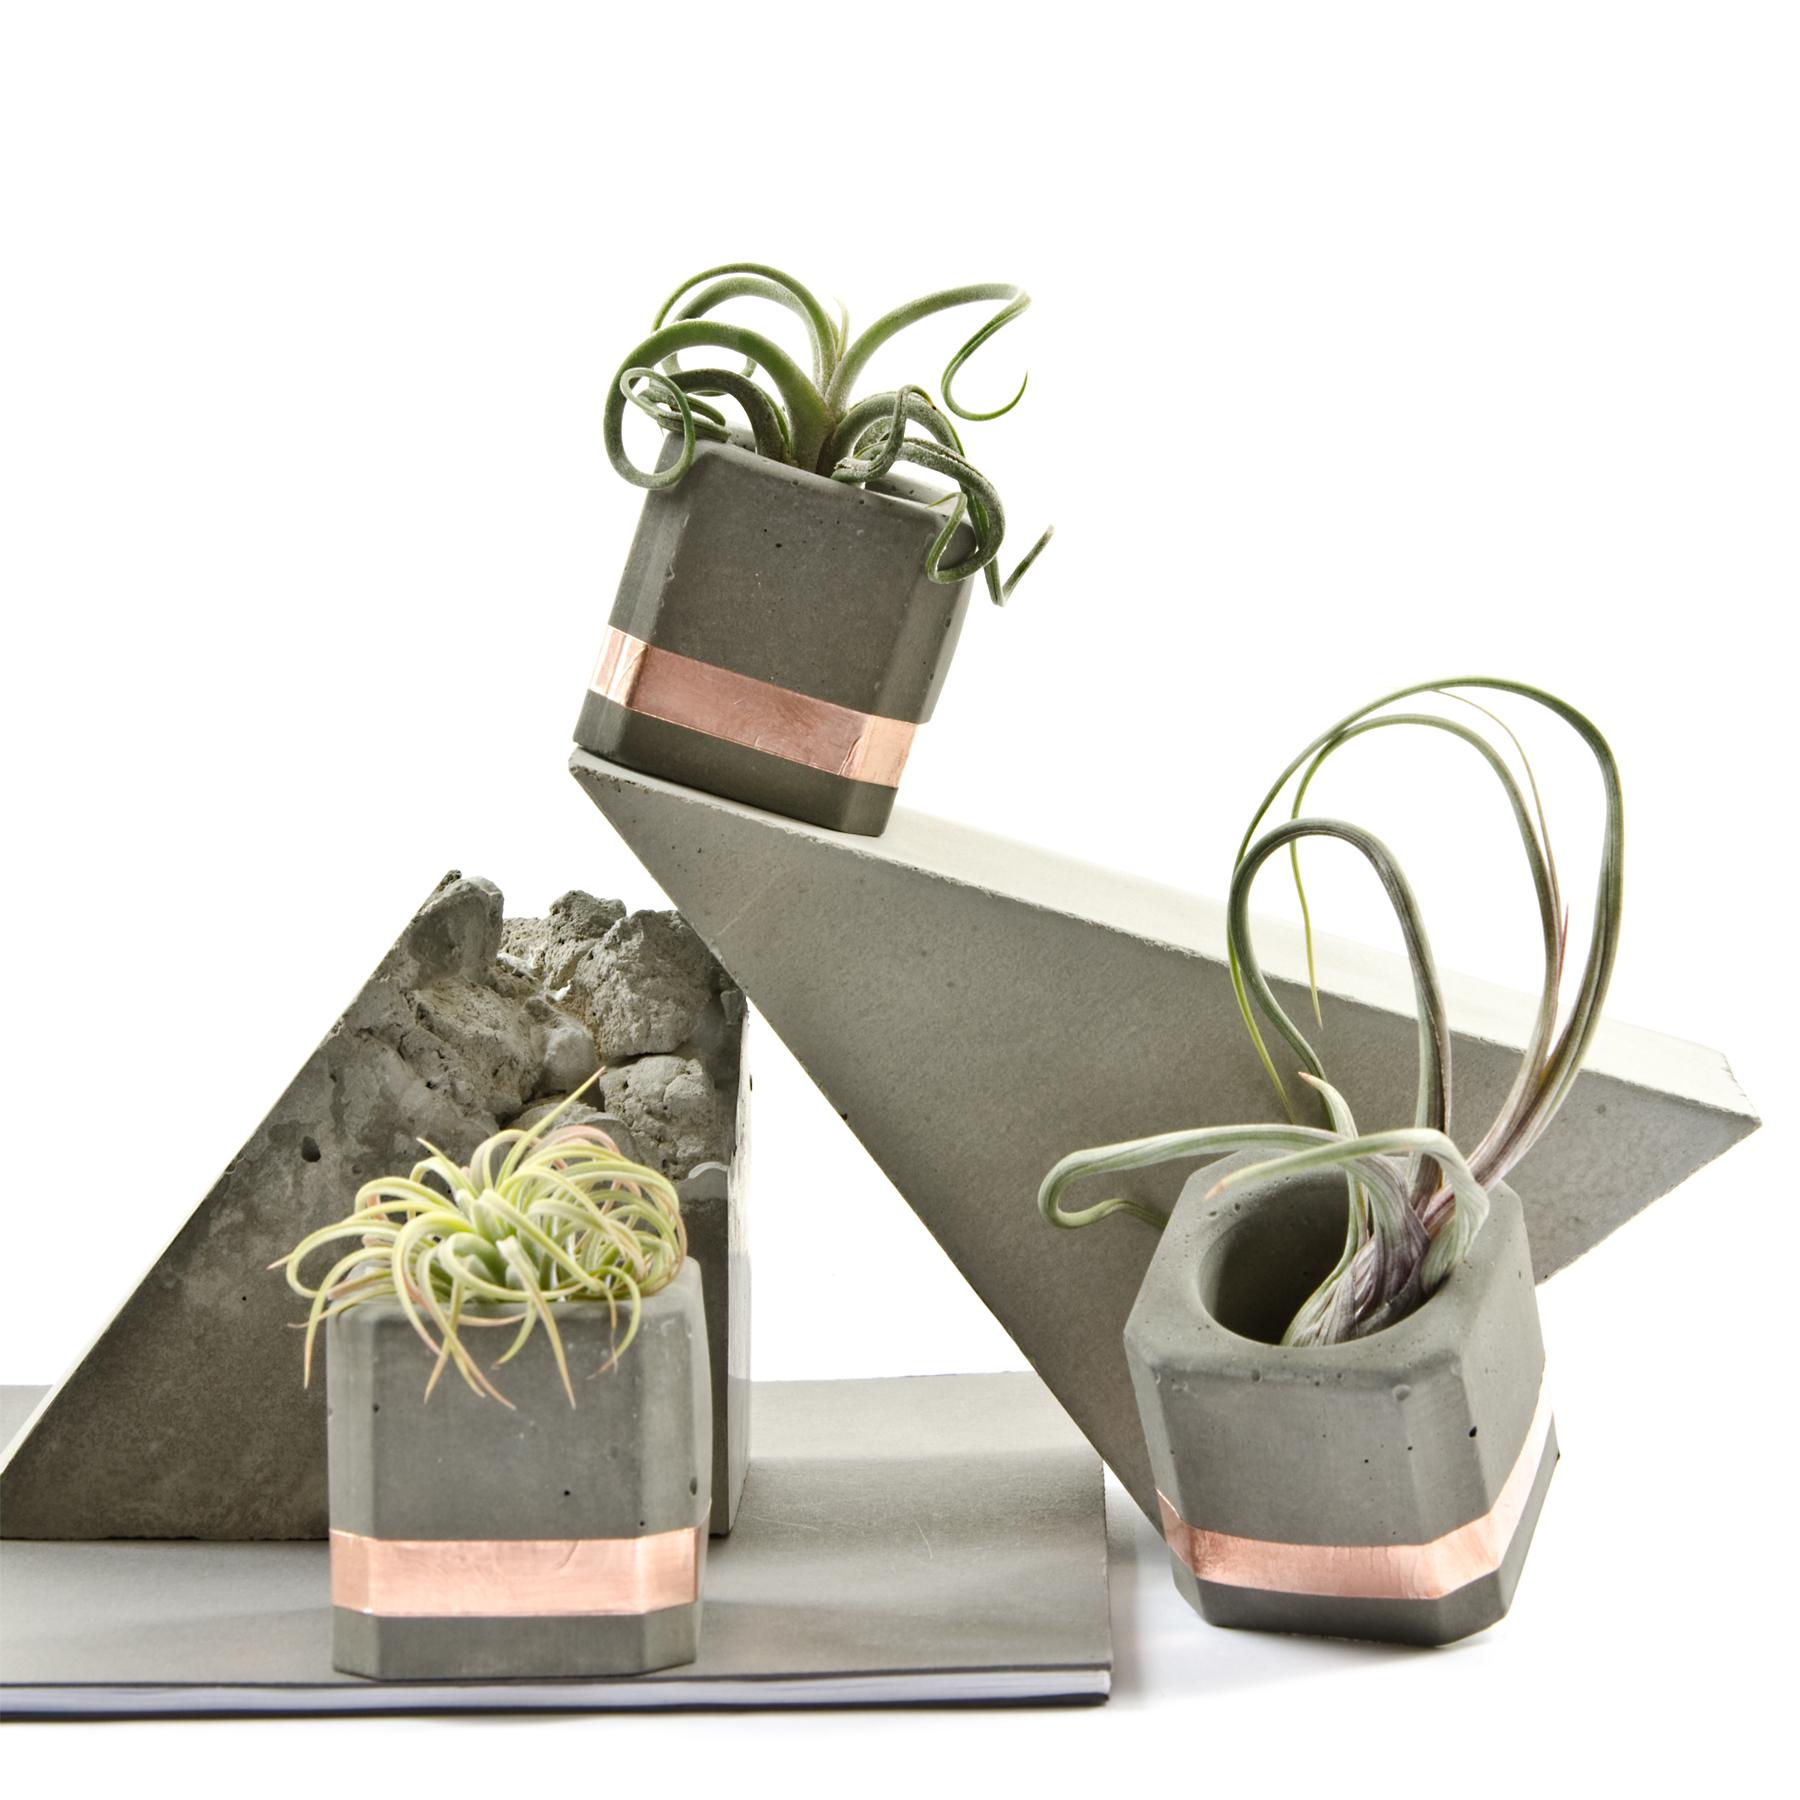 Concrete Copper Planter Cups by PASiNGA